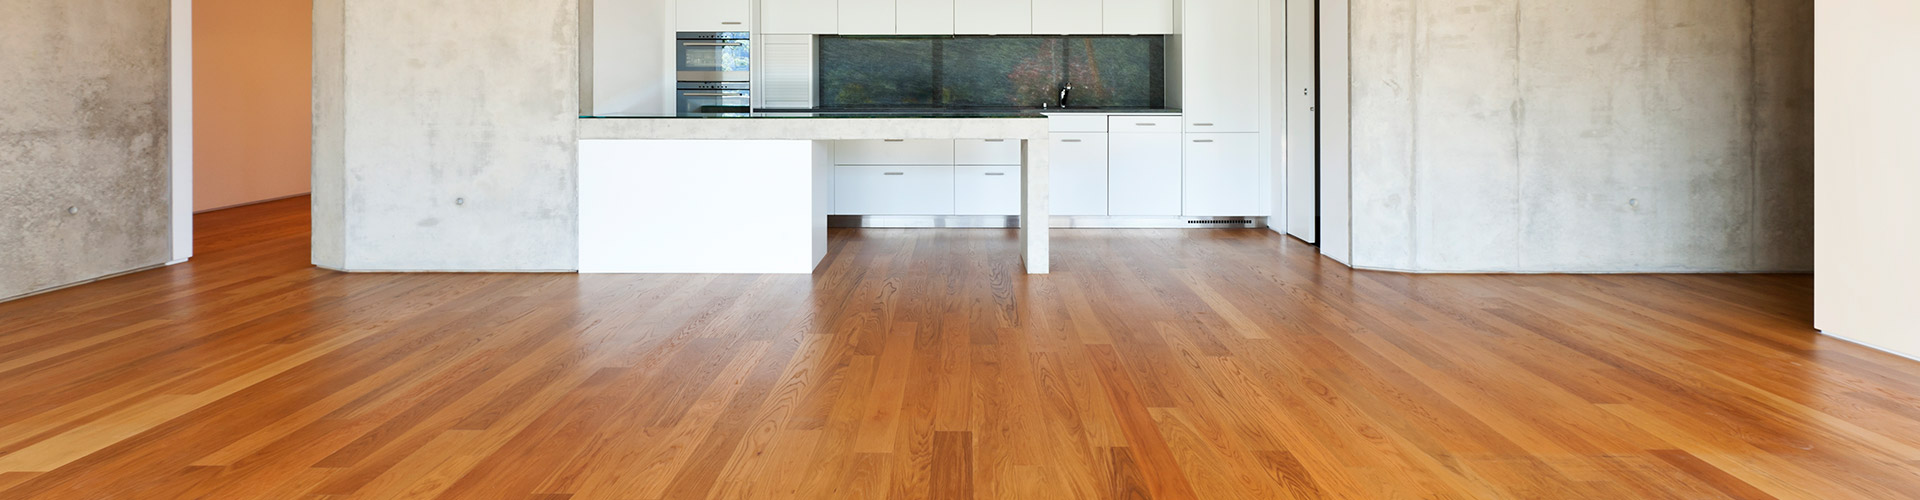 Engineered Hardwood Floors Wood Laminate Flooring In Selden